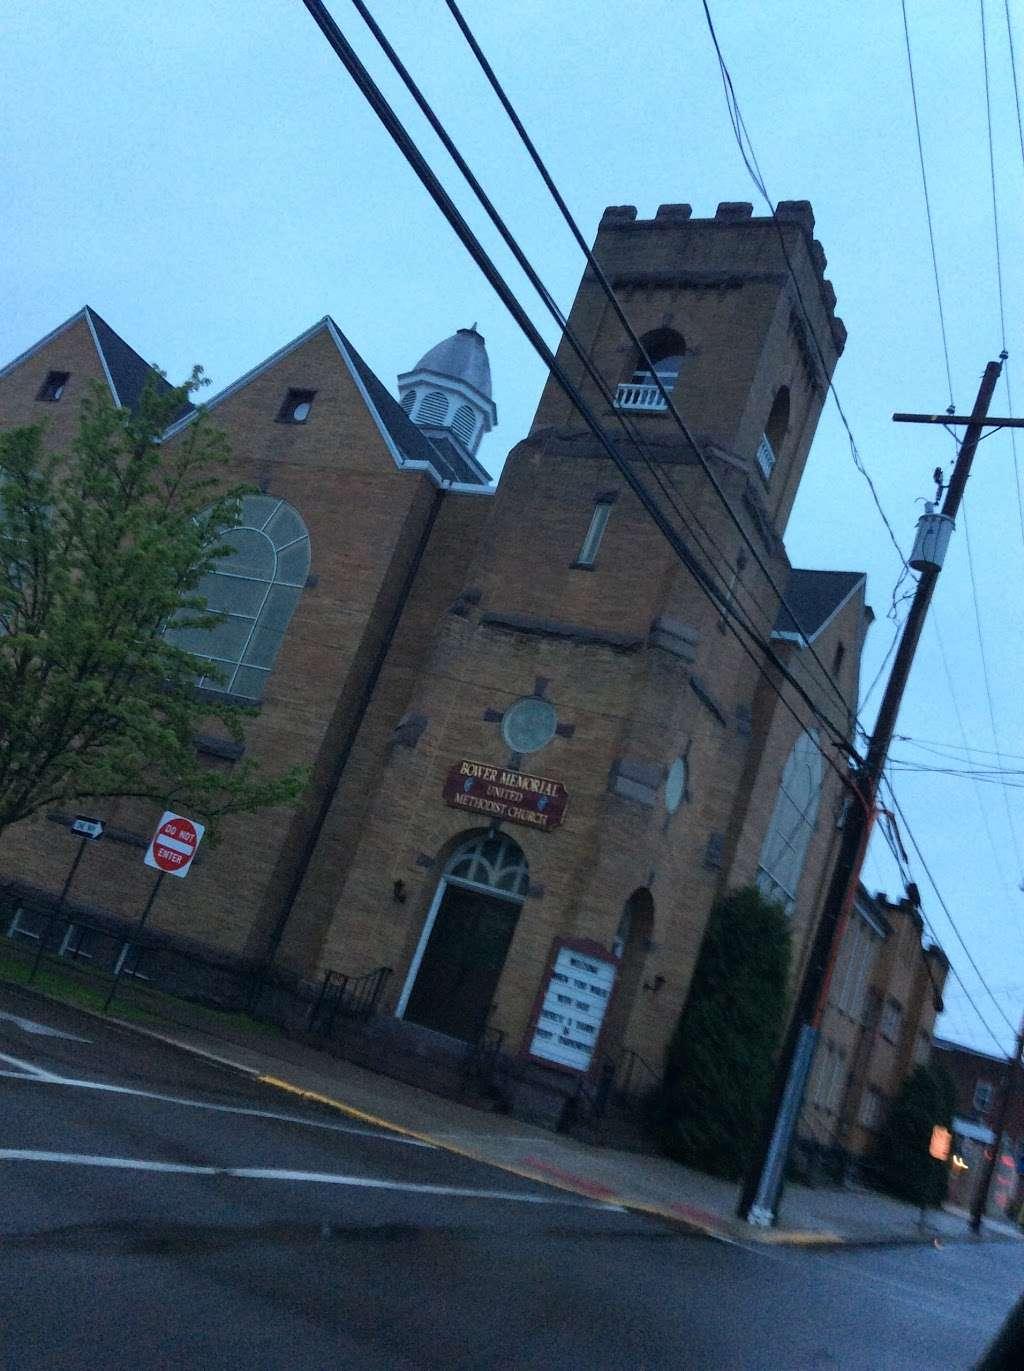 Bower Memorial United Methodist Church - church  | Photo 1 of 5 | Address: 140 E 2nd St, Berwick, PA 18603, USA | Phone: (570) 752-6262